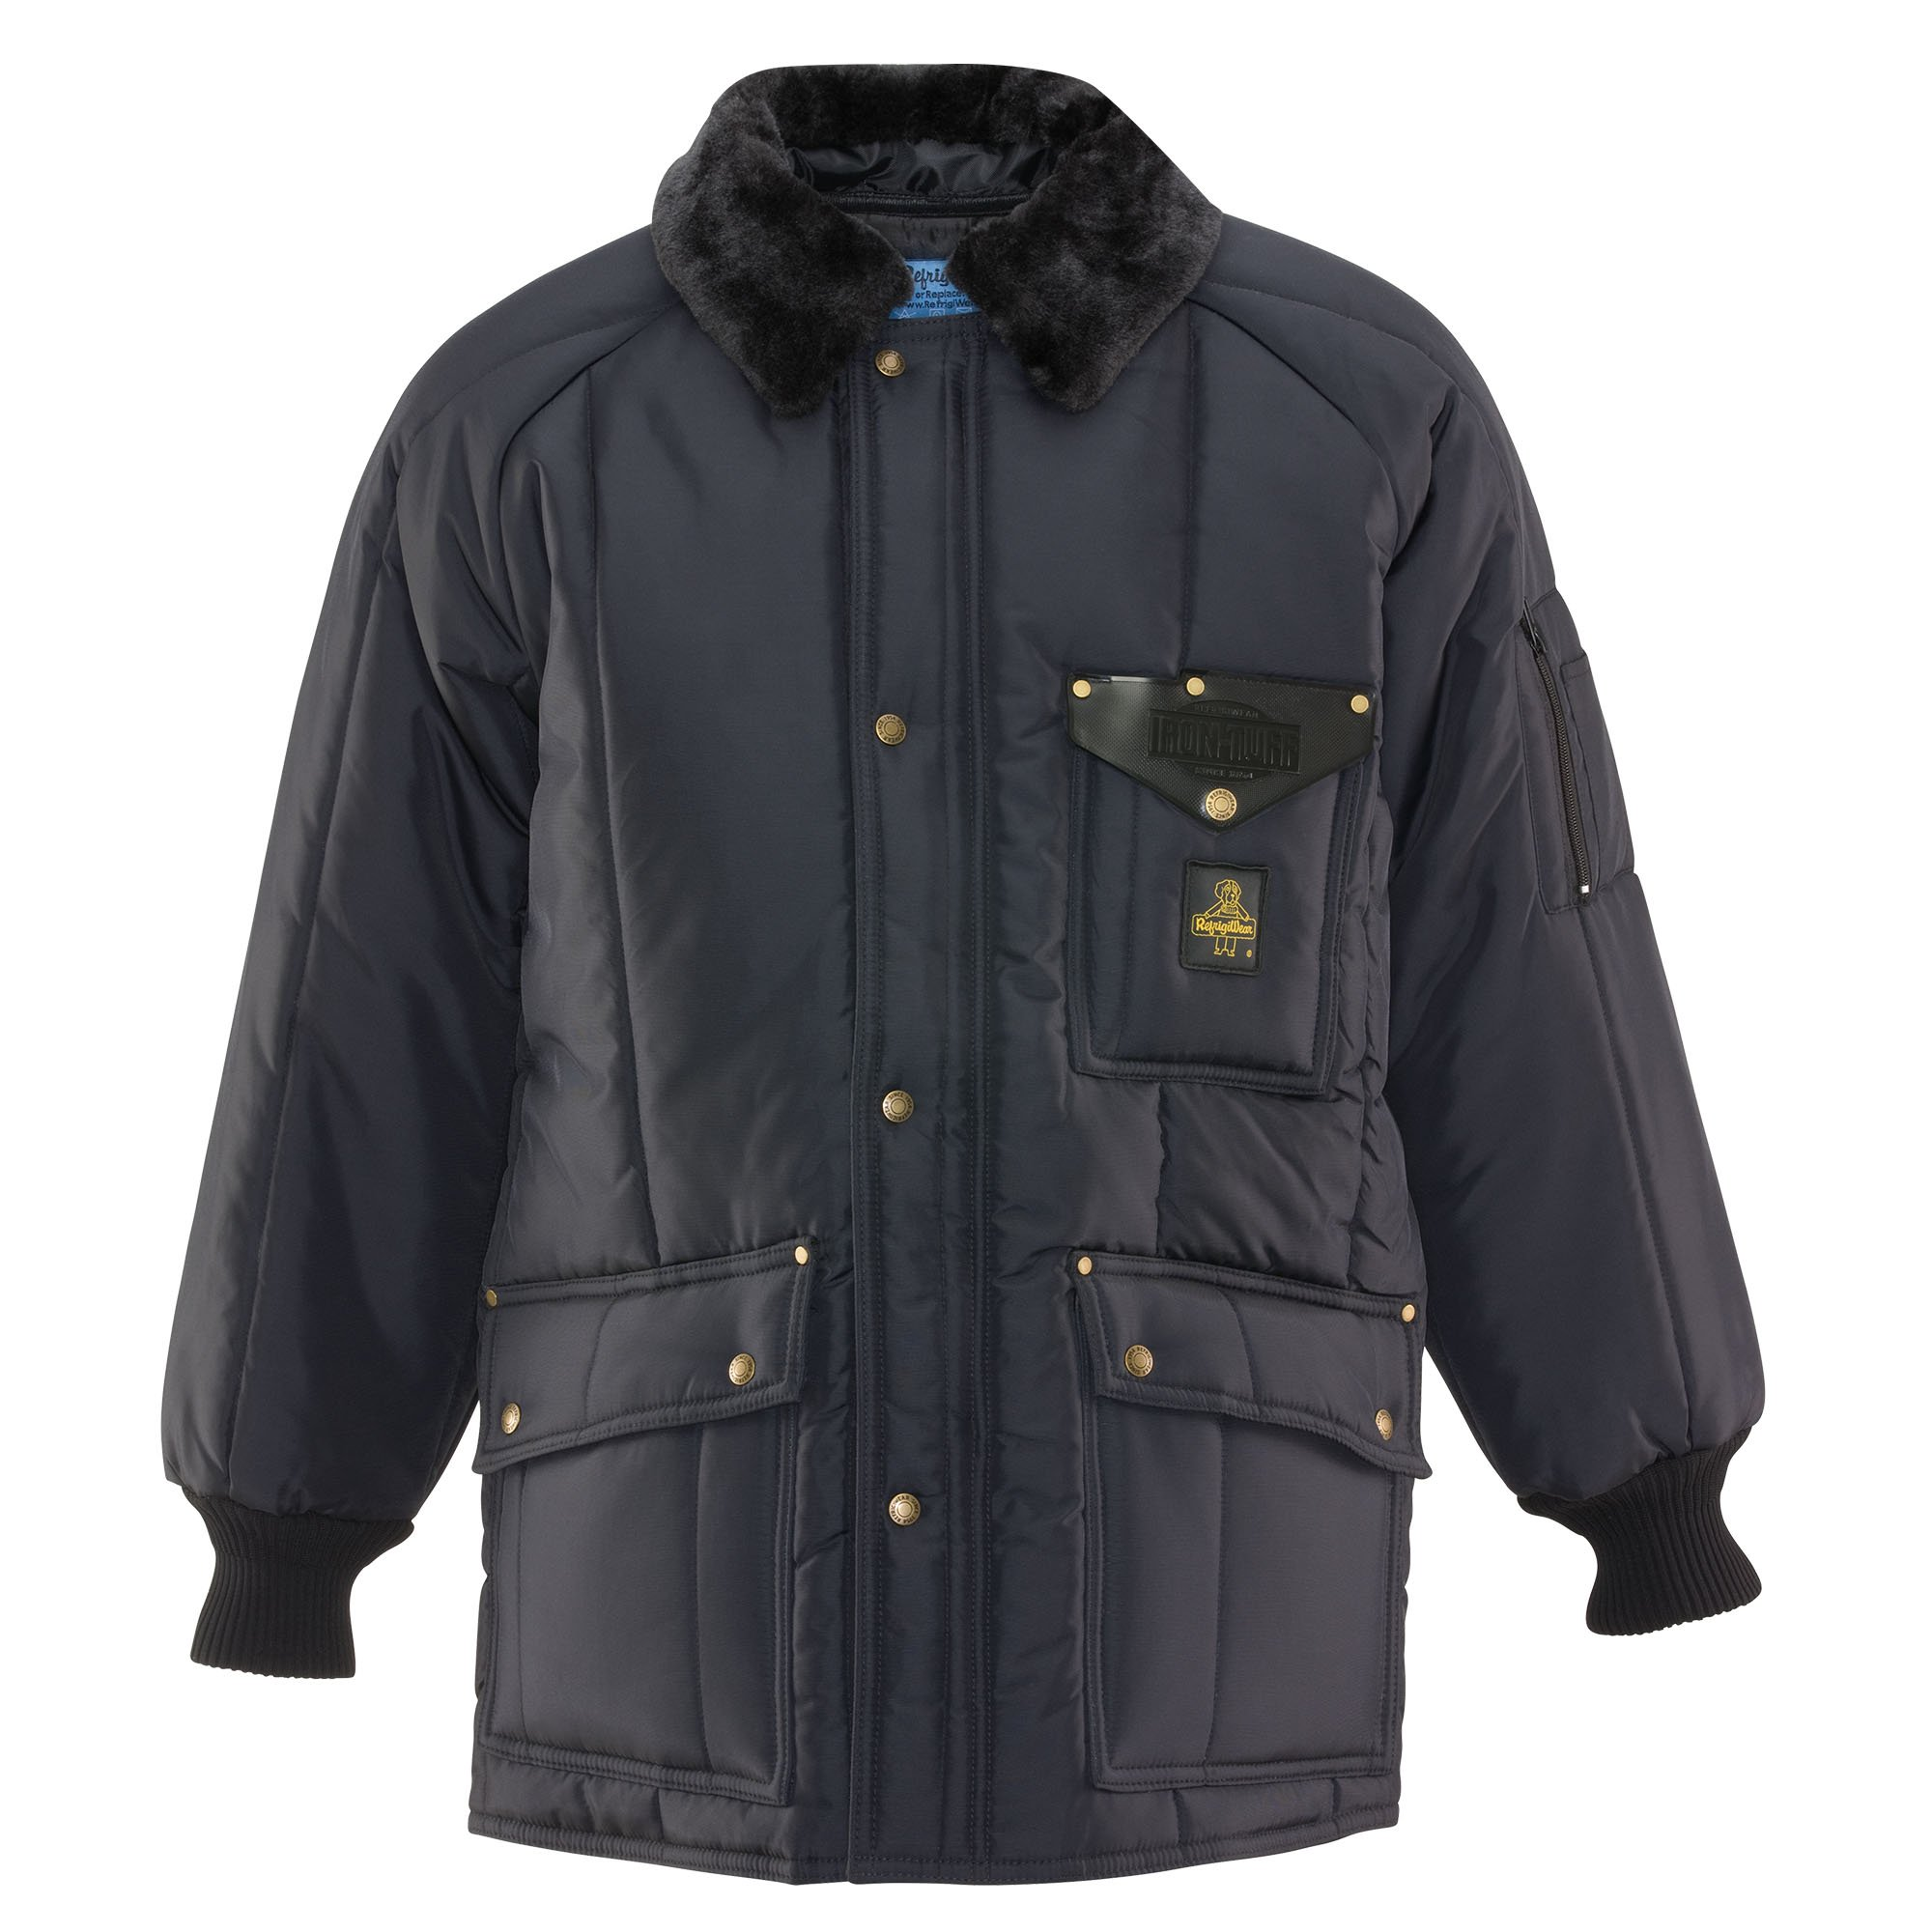 Refrigiwear Men's Water-Resistant Insulated Iron-Tuff Siberian Workwear Jacket with Soft Fleece Collar (Navy Blue, 2XL)